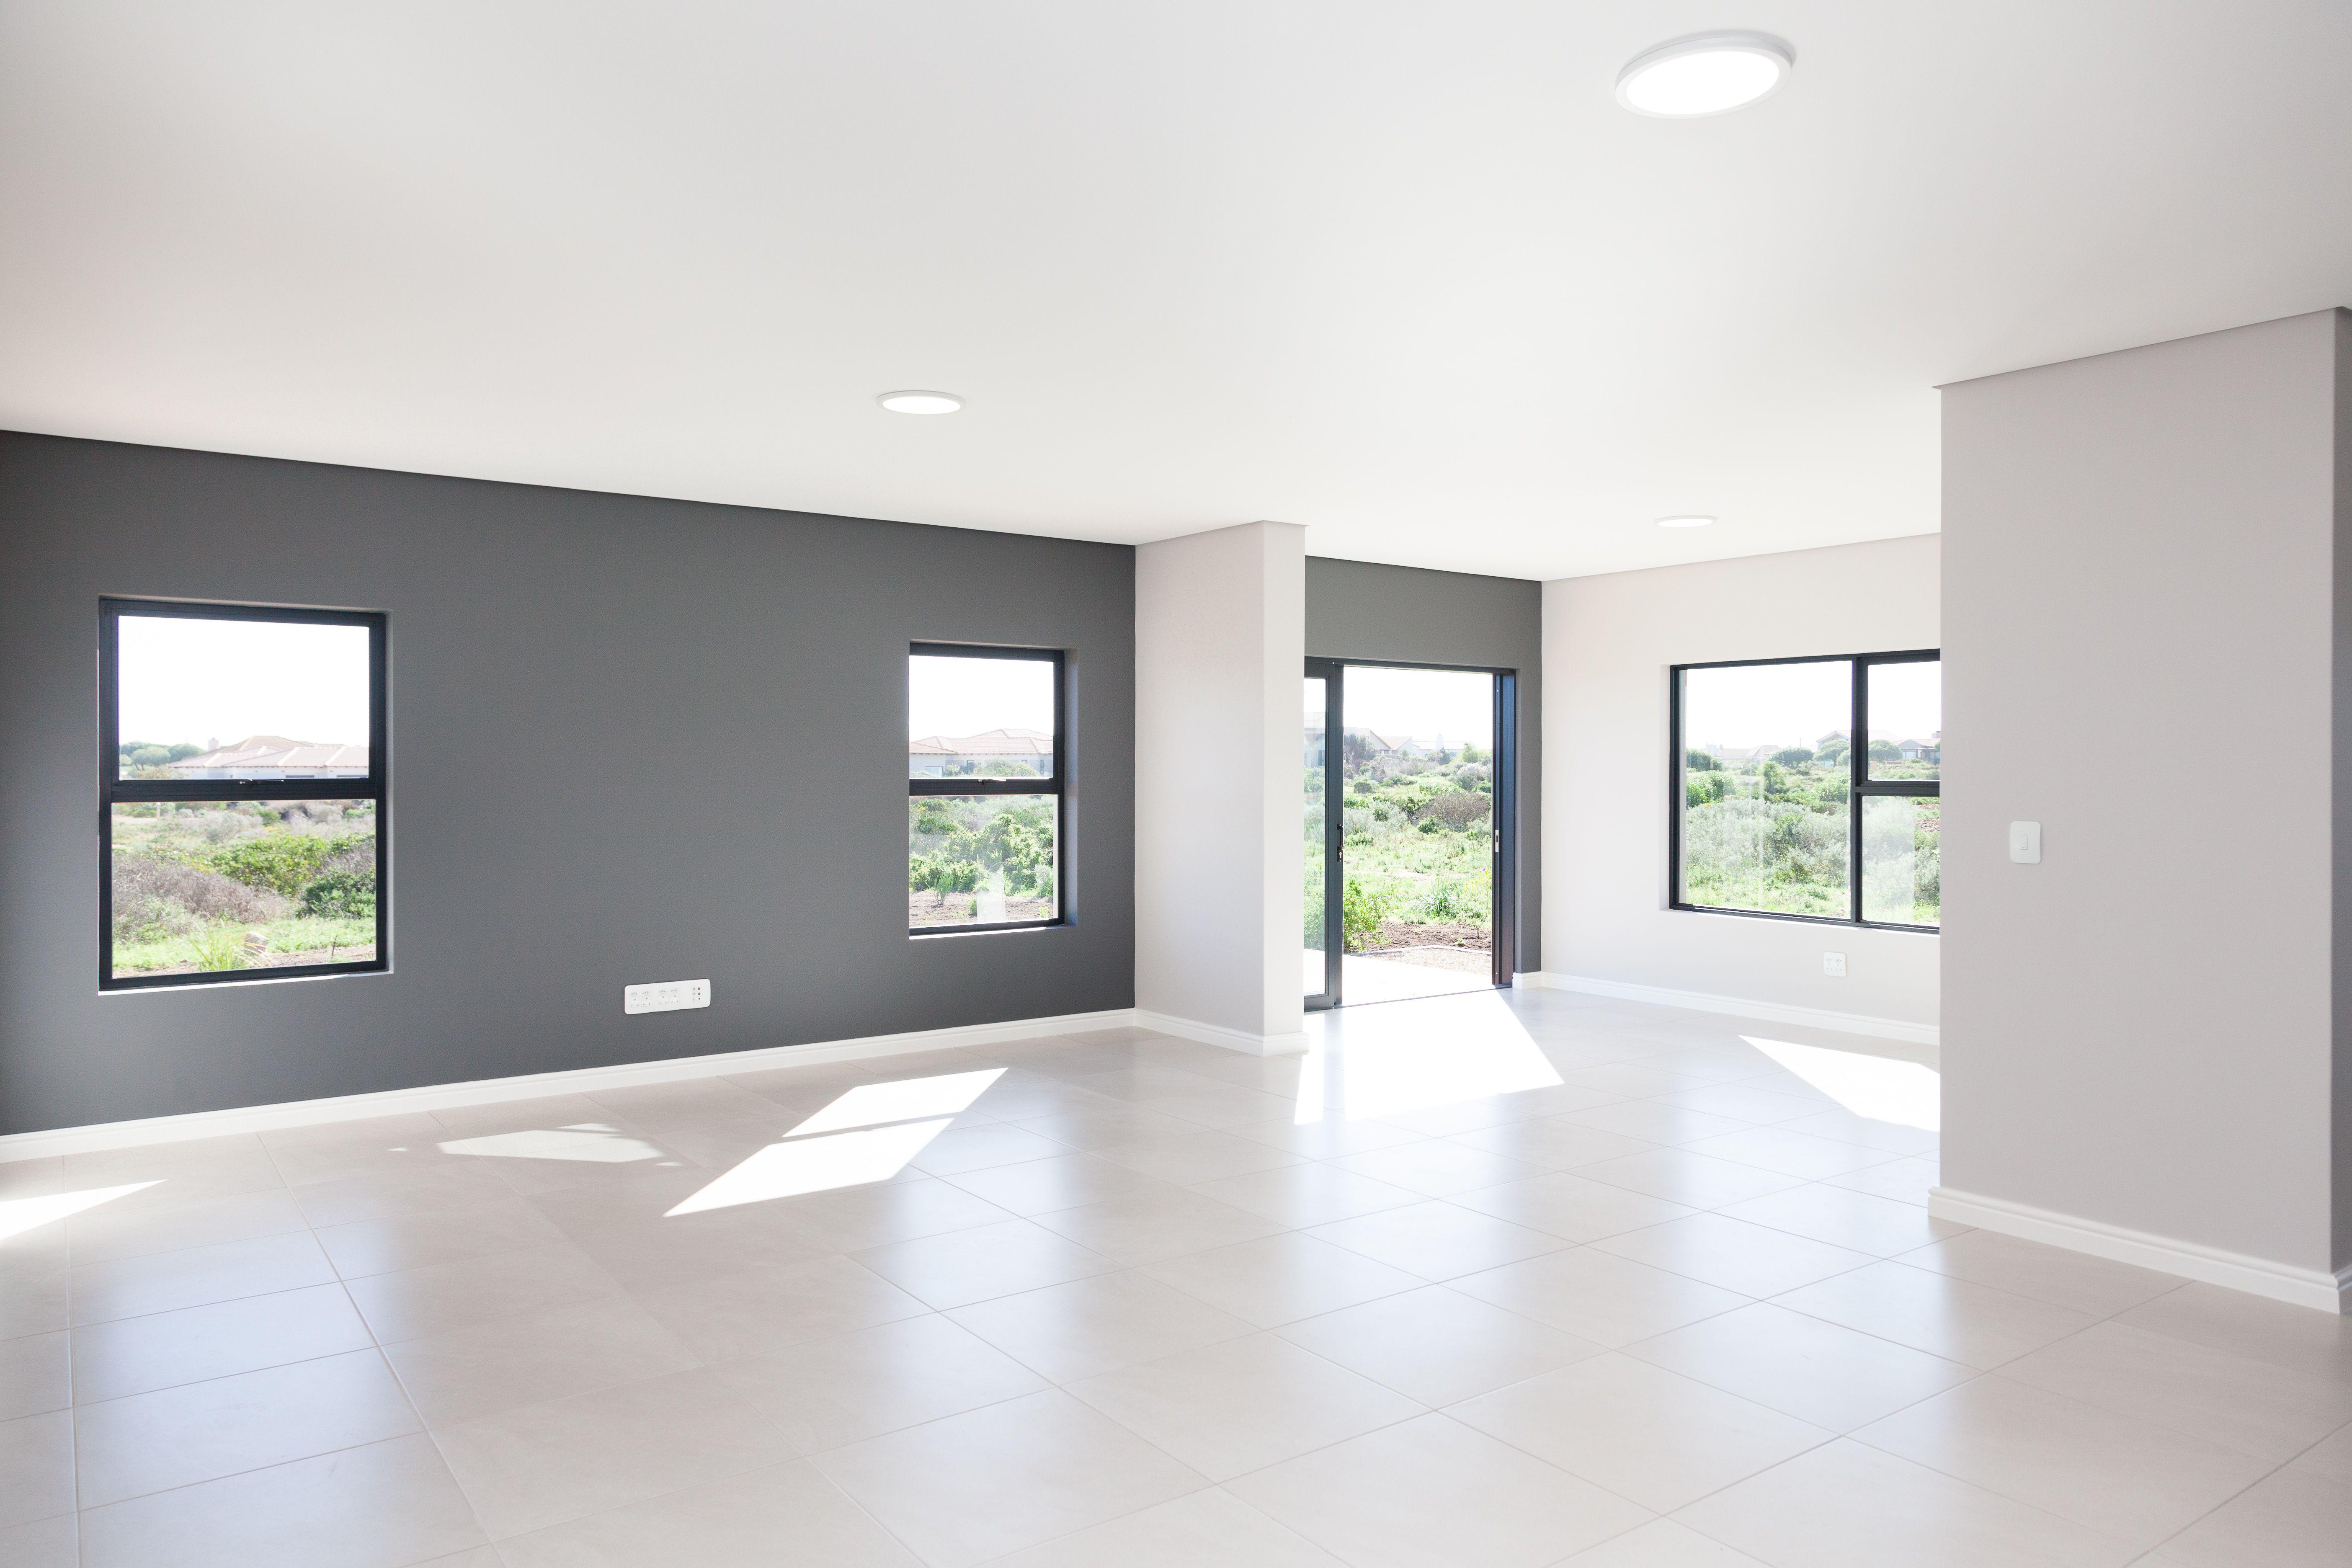 Modern Open Plan House Design Grey Walls 1058 On Schapejacht Langebaan Country Estate Living Grey Walls Living Room Grey Accent Wall White Floors Living Room